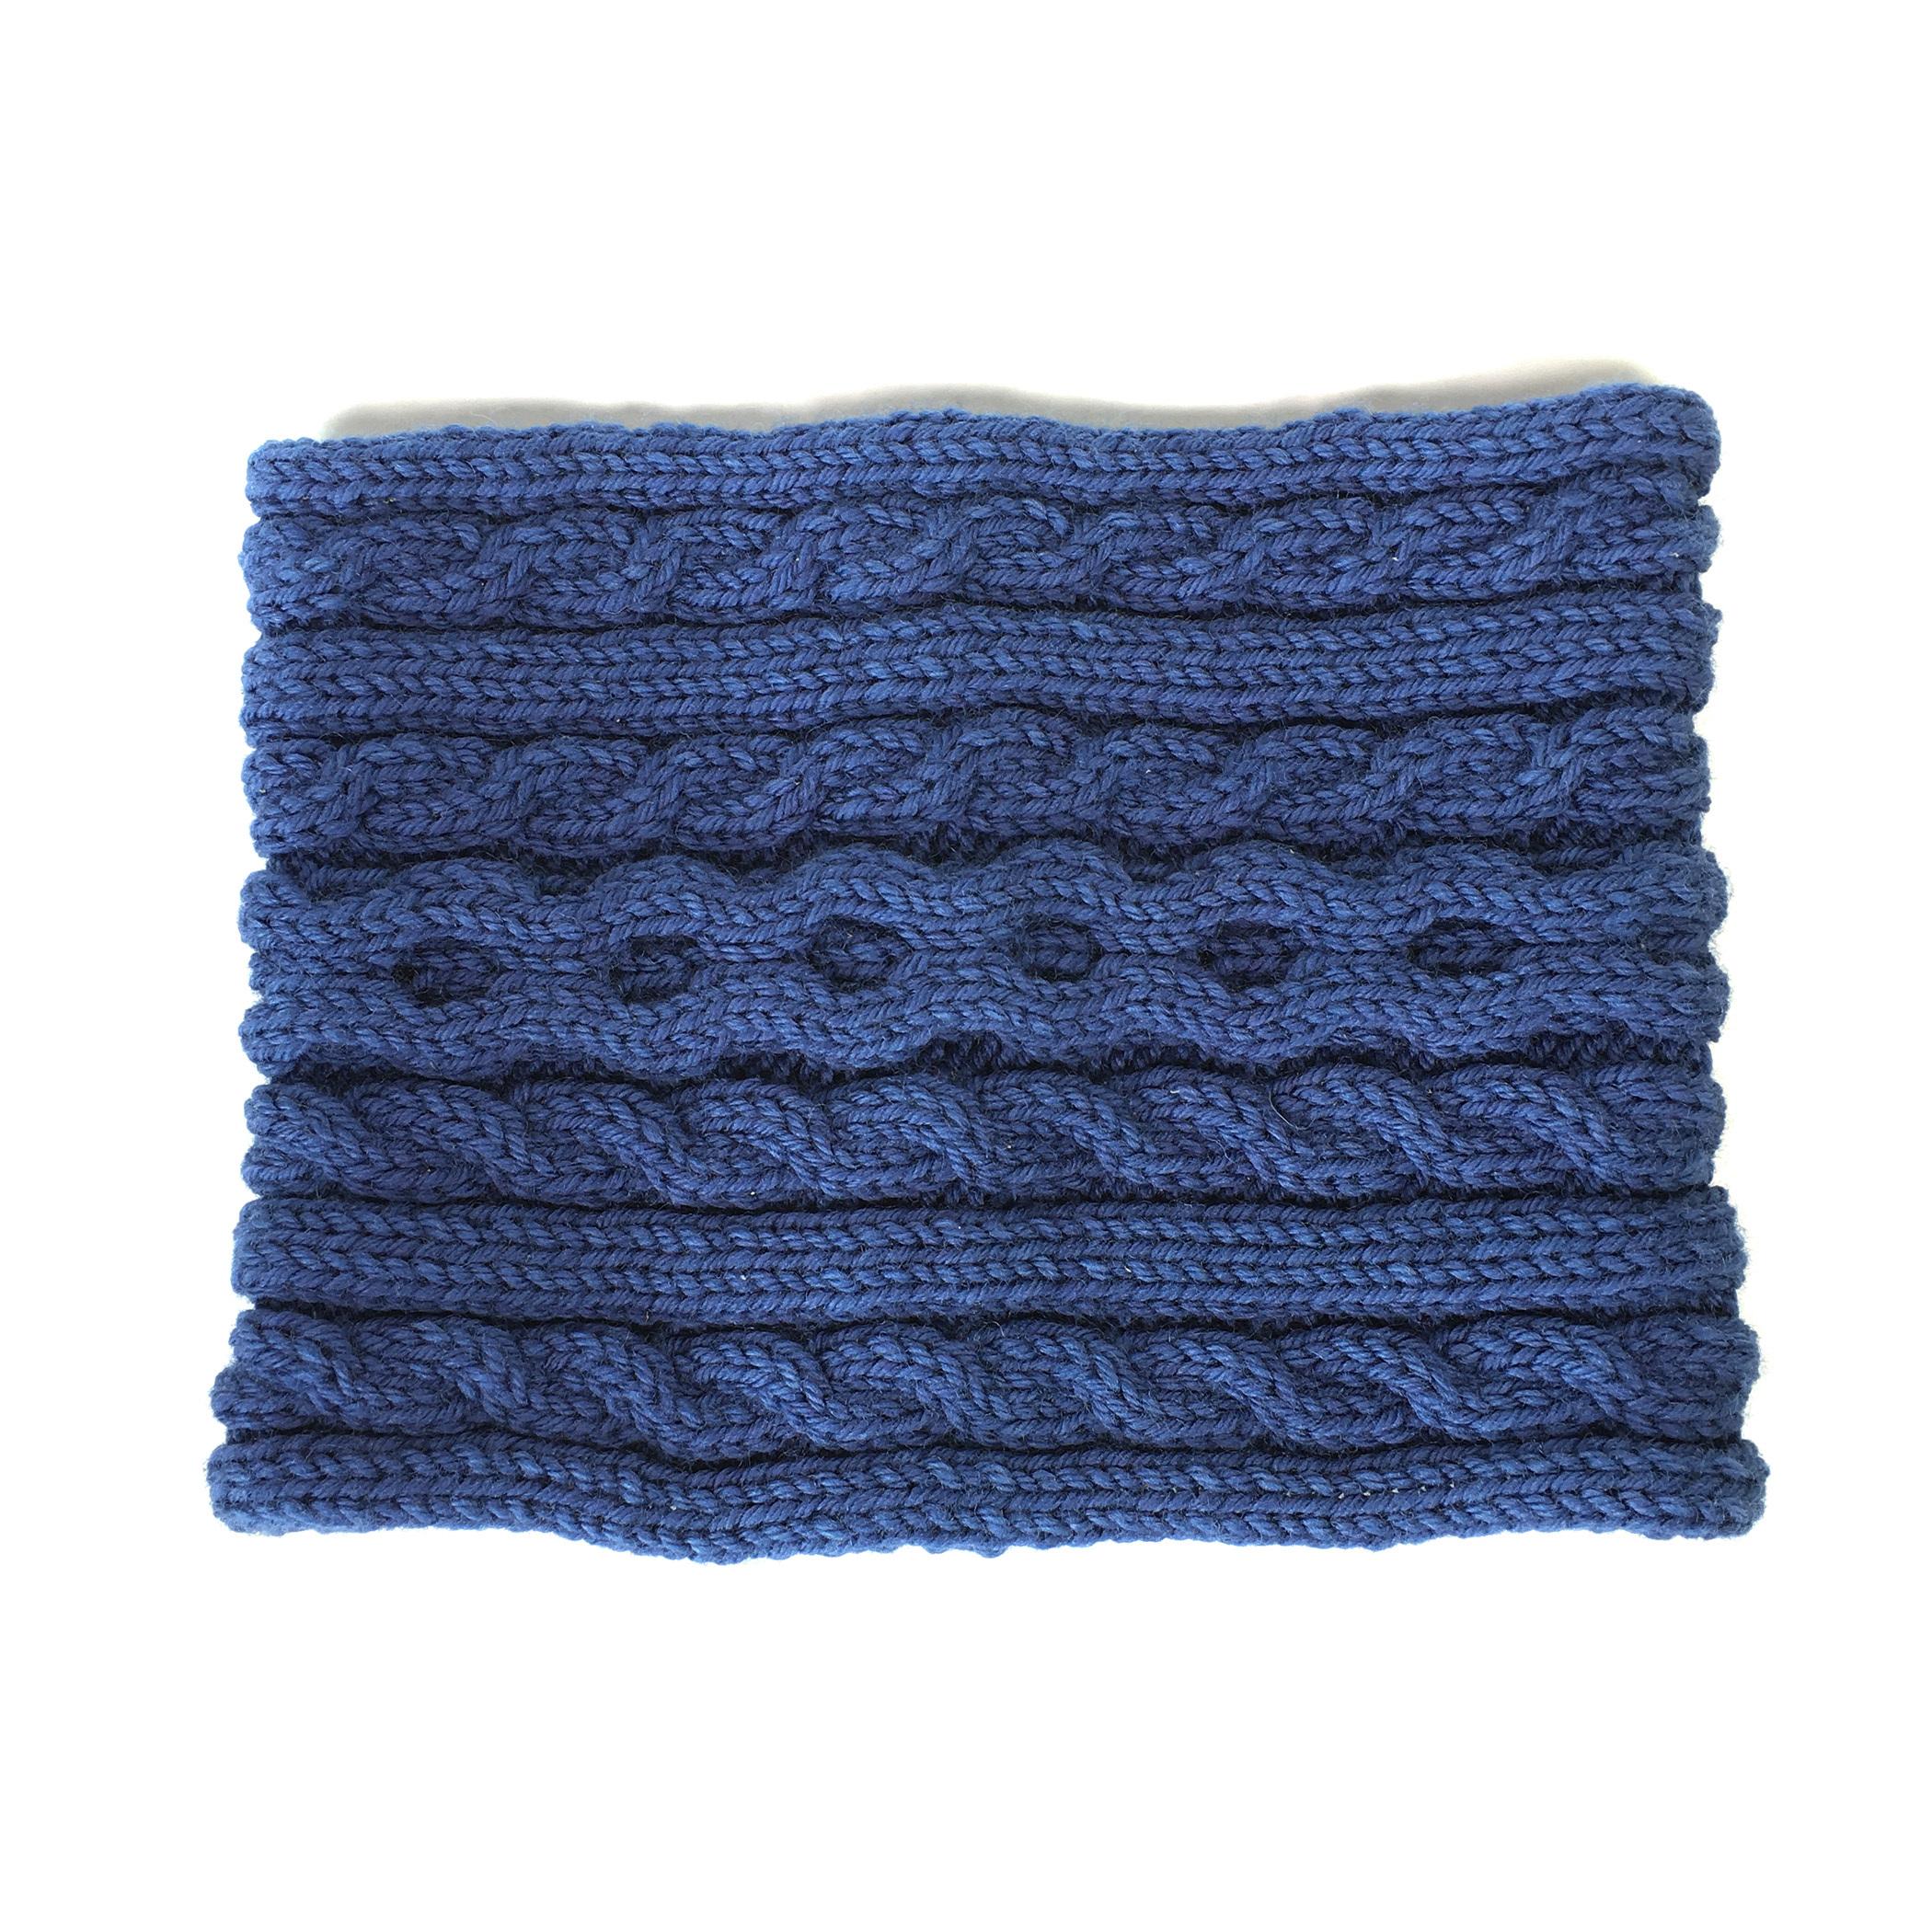 Merino wool natural indigo Snood